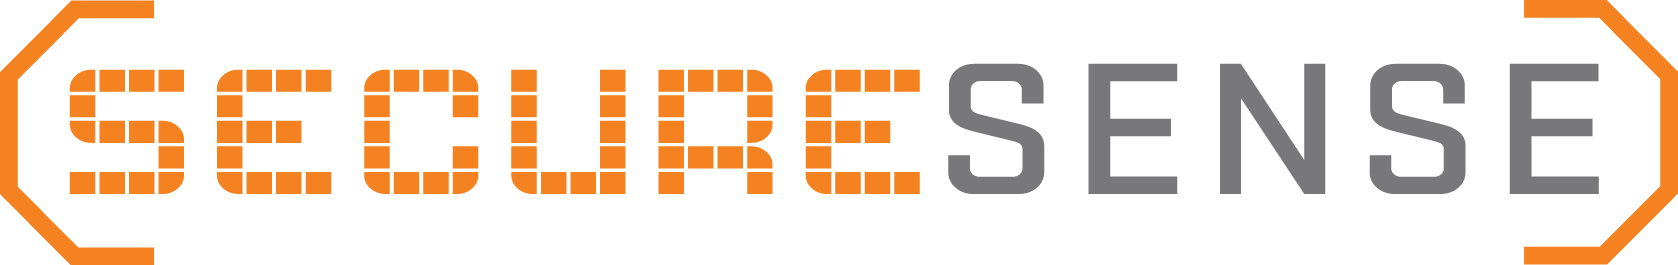 SecureSense_print